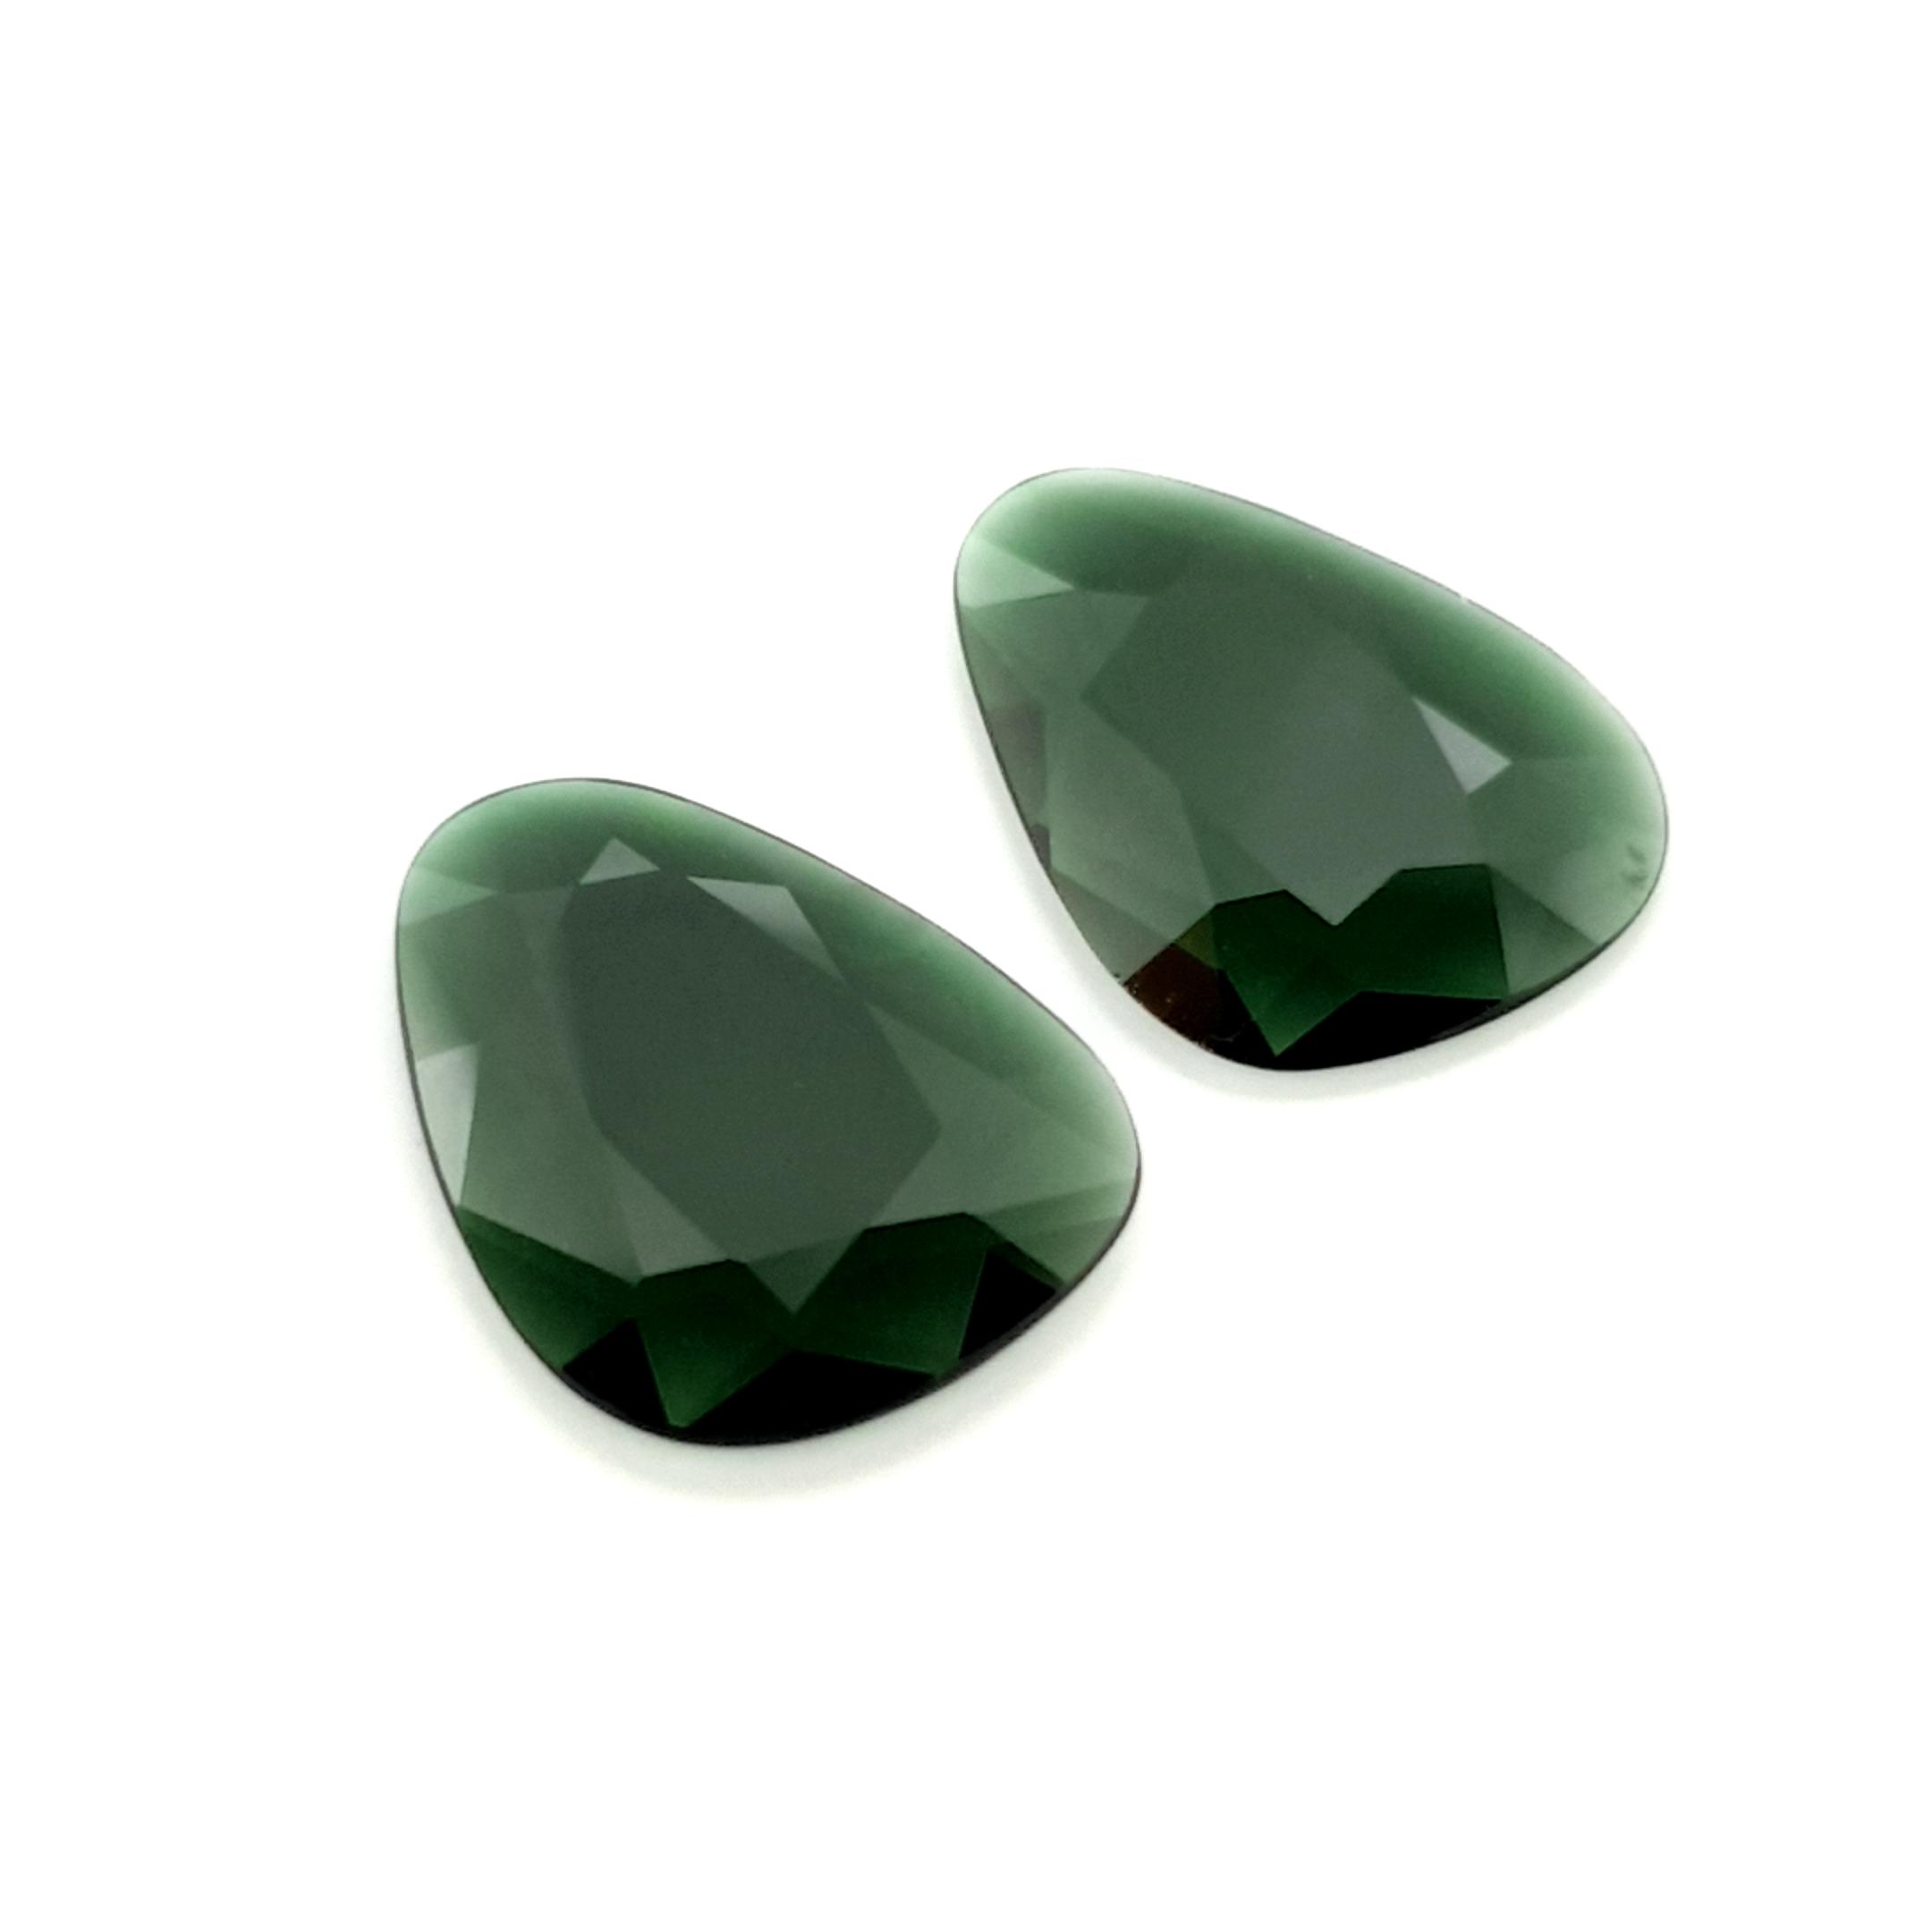 6,24ct. Pair Imperial Green Tourmalin DoubleRoseCut TMJ18C6 ClaudiaHamann__2021-02-11-17-48-04